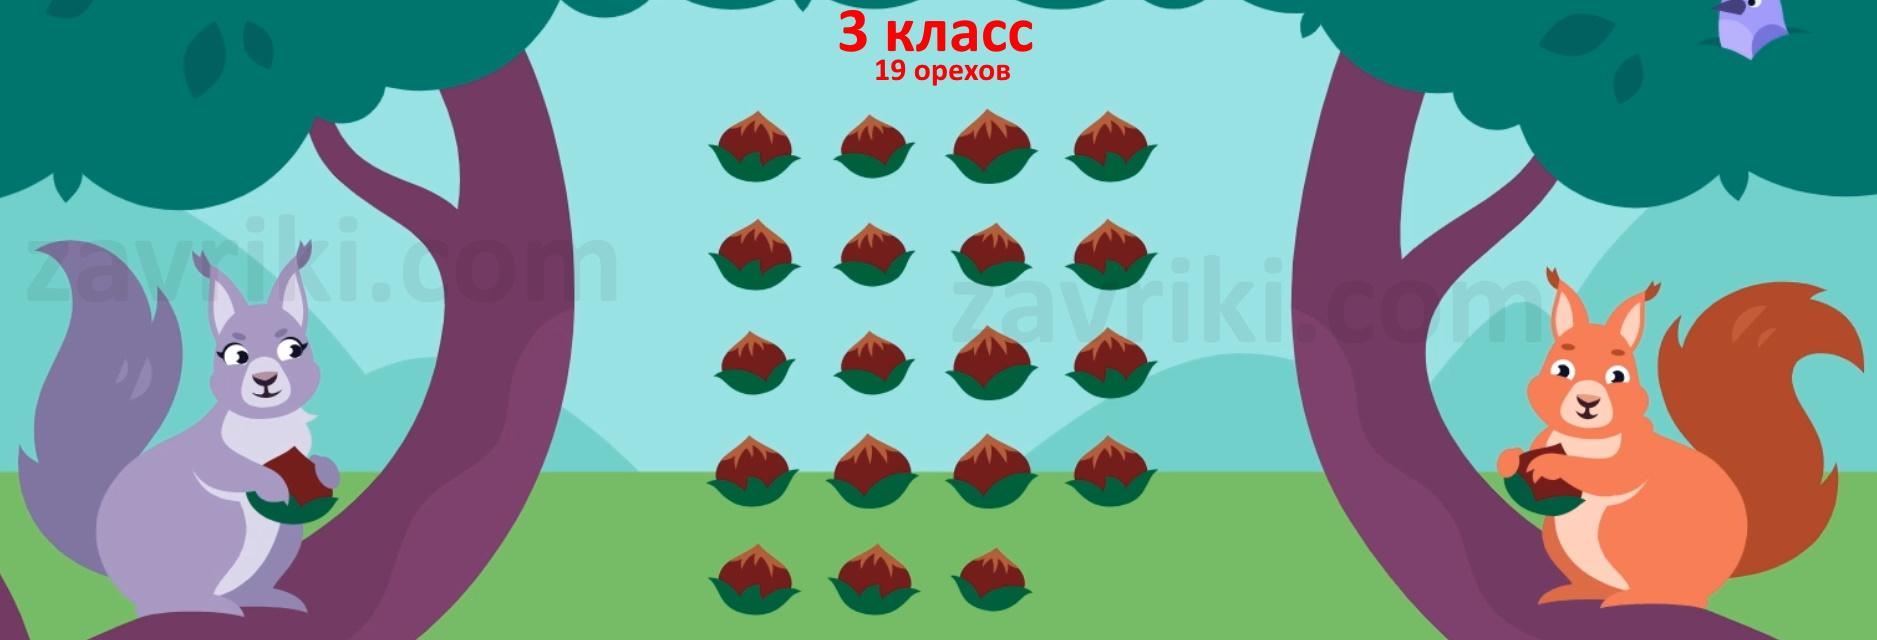 Белки делят орехи 3 класс Учи.ру